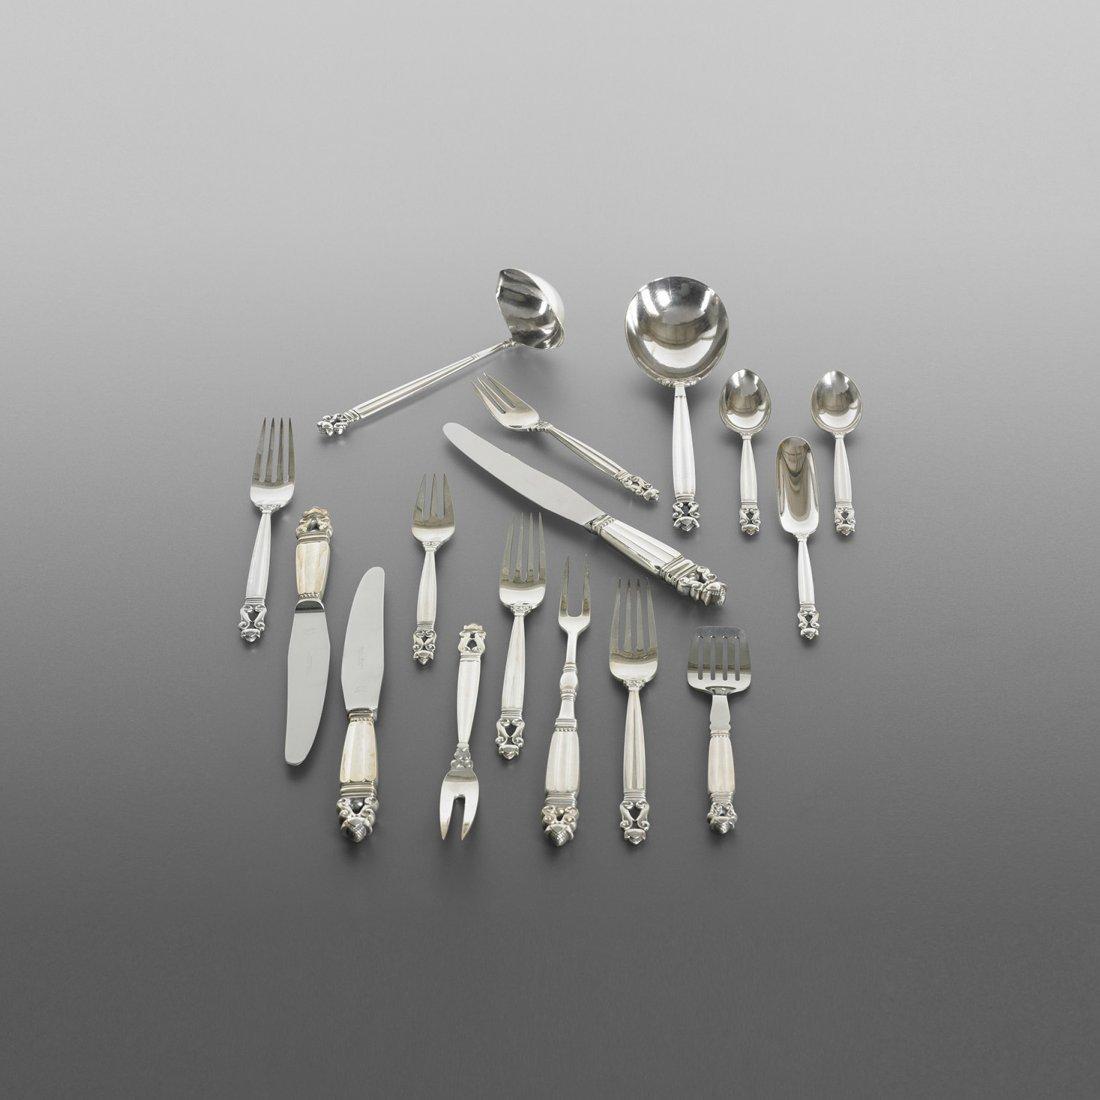 147: Johan Rohde Acorn silverware